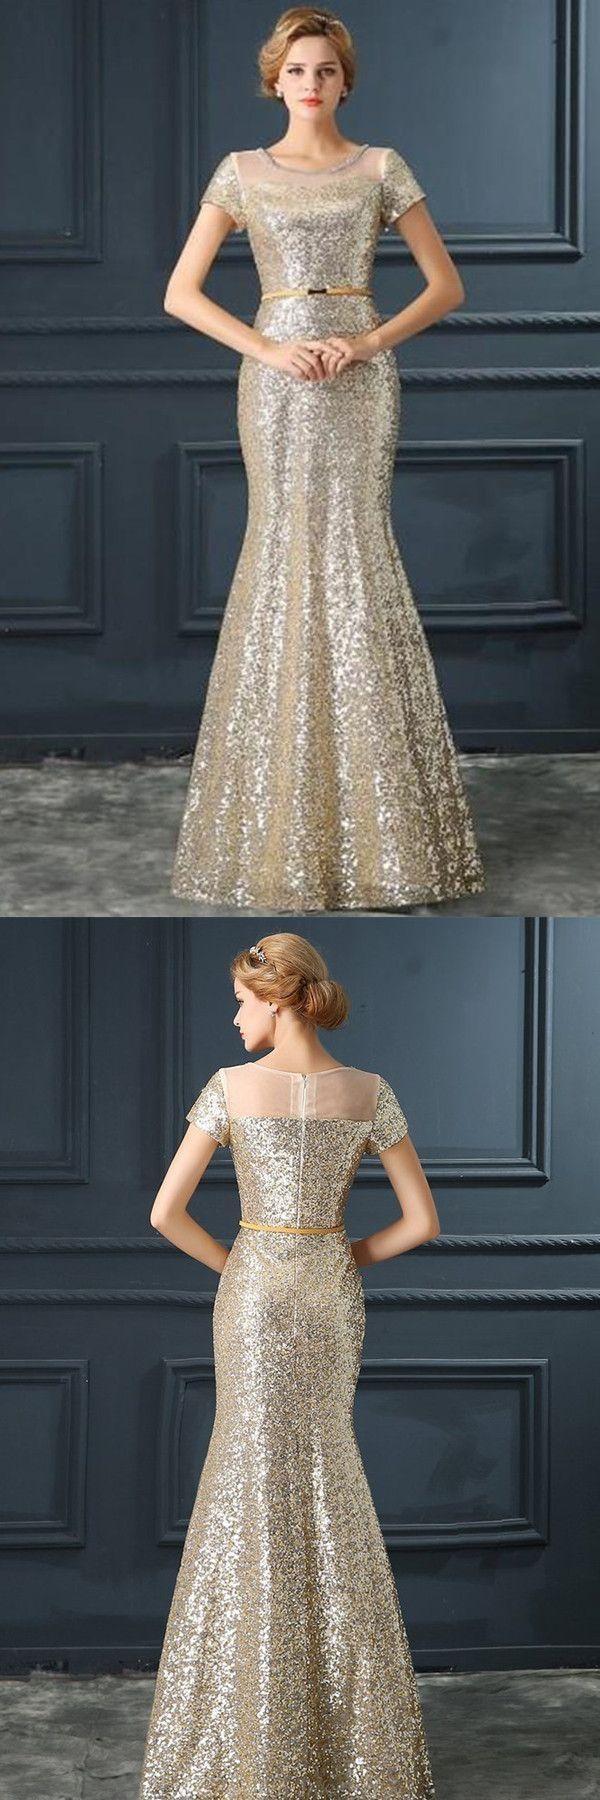 Cheap engrossing prom dresses mermaid stunning jewel short sleeves